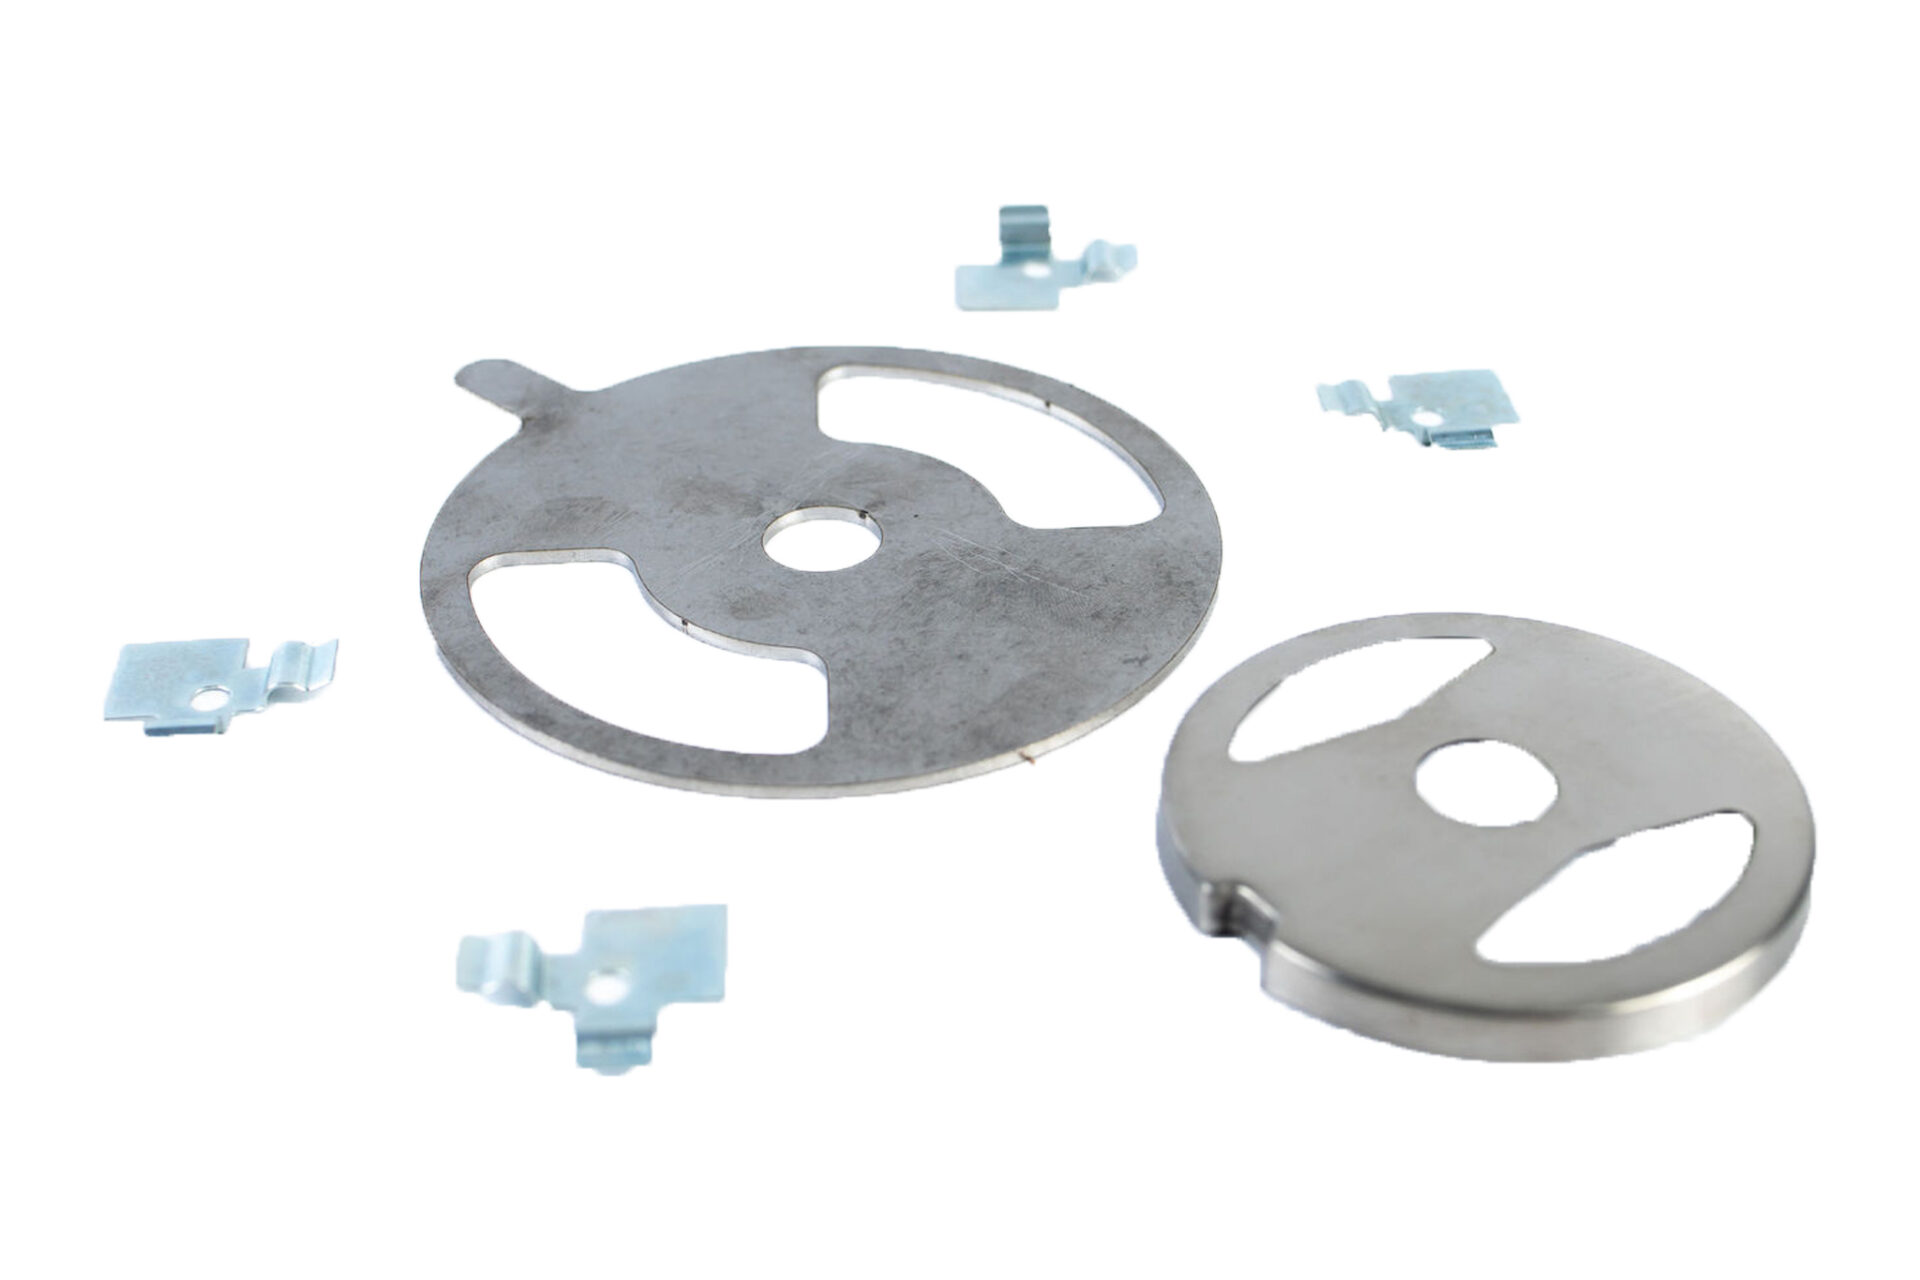 miscellaneous silver metal parts